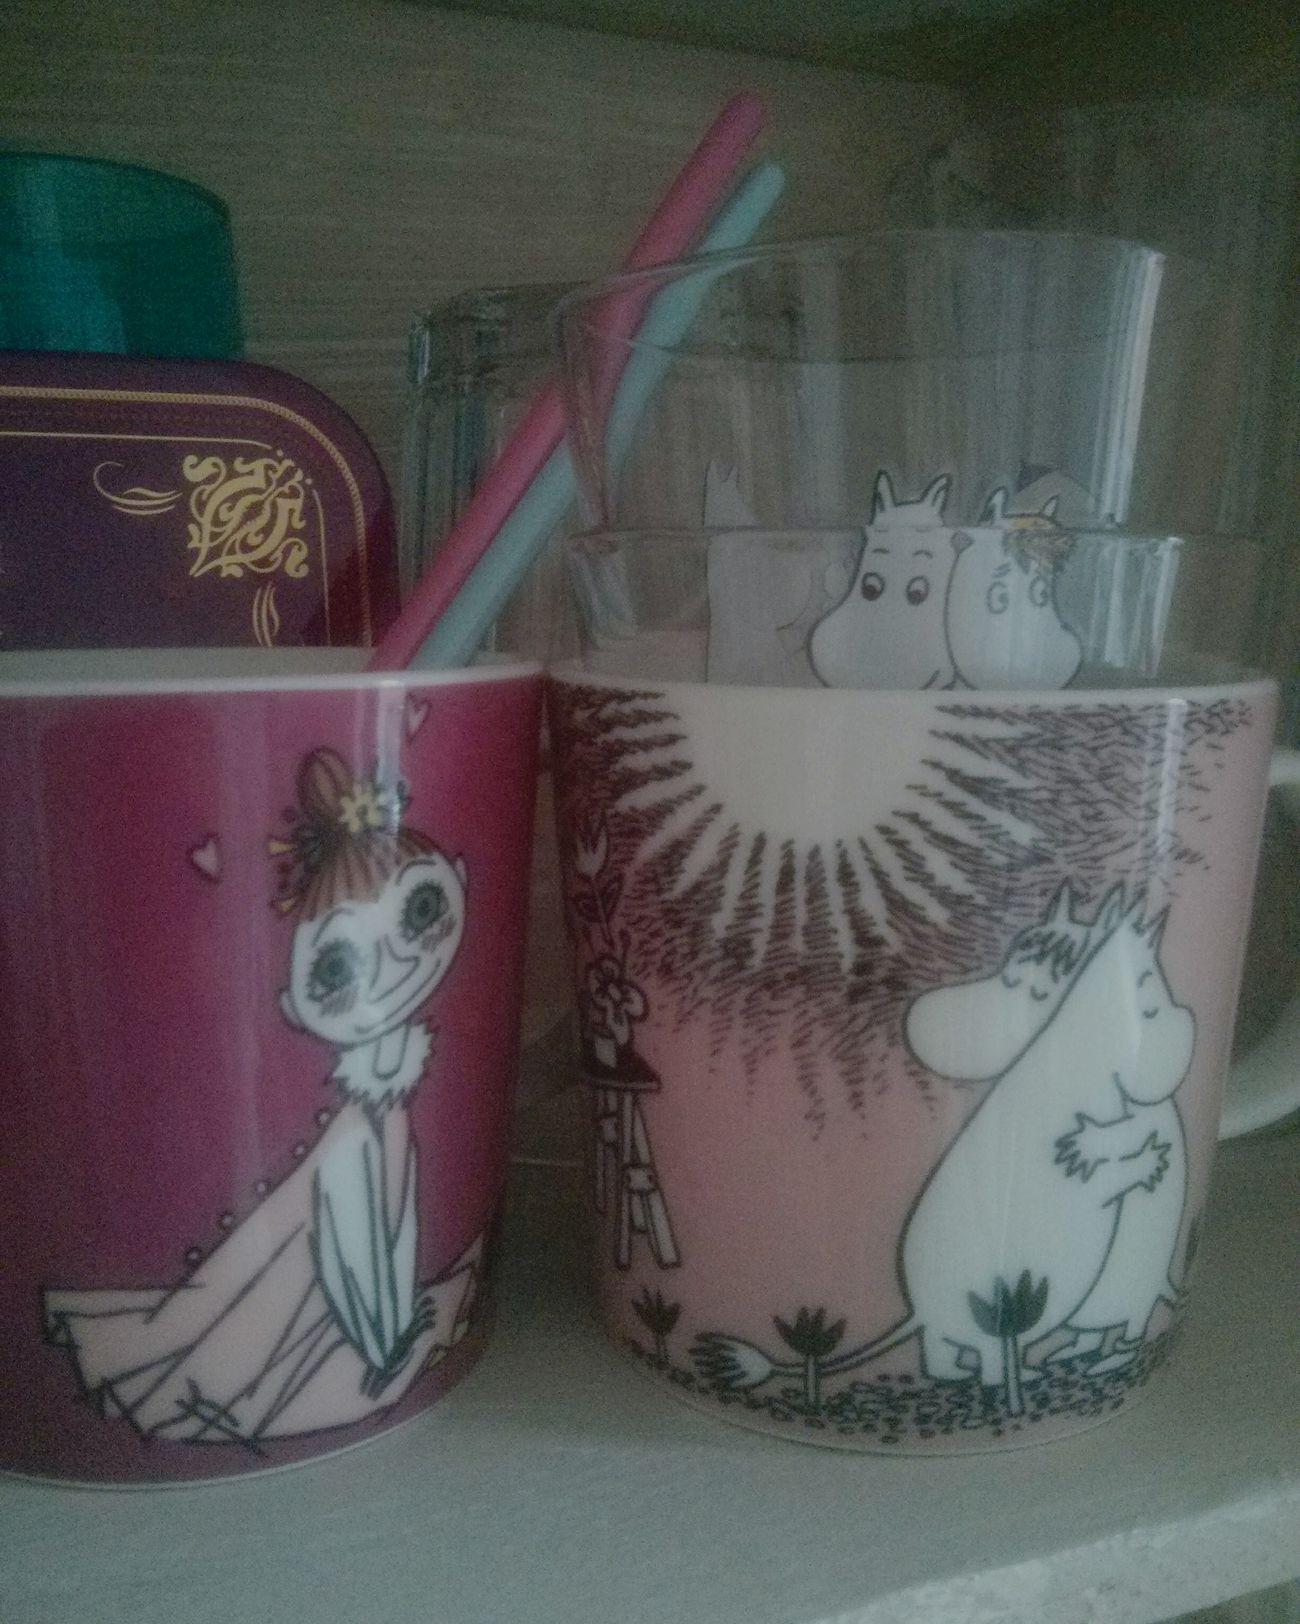 Arabia Finland Muumi Moomin Muumilaakso Moomin Characters Dishes Moomins! Scandinavian Design Scandinavian Interior